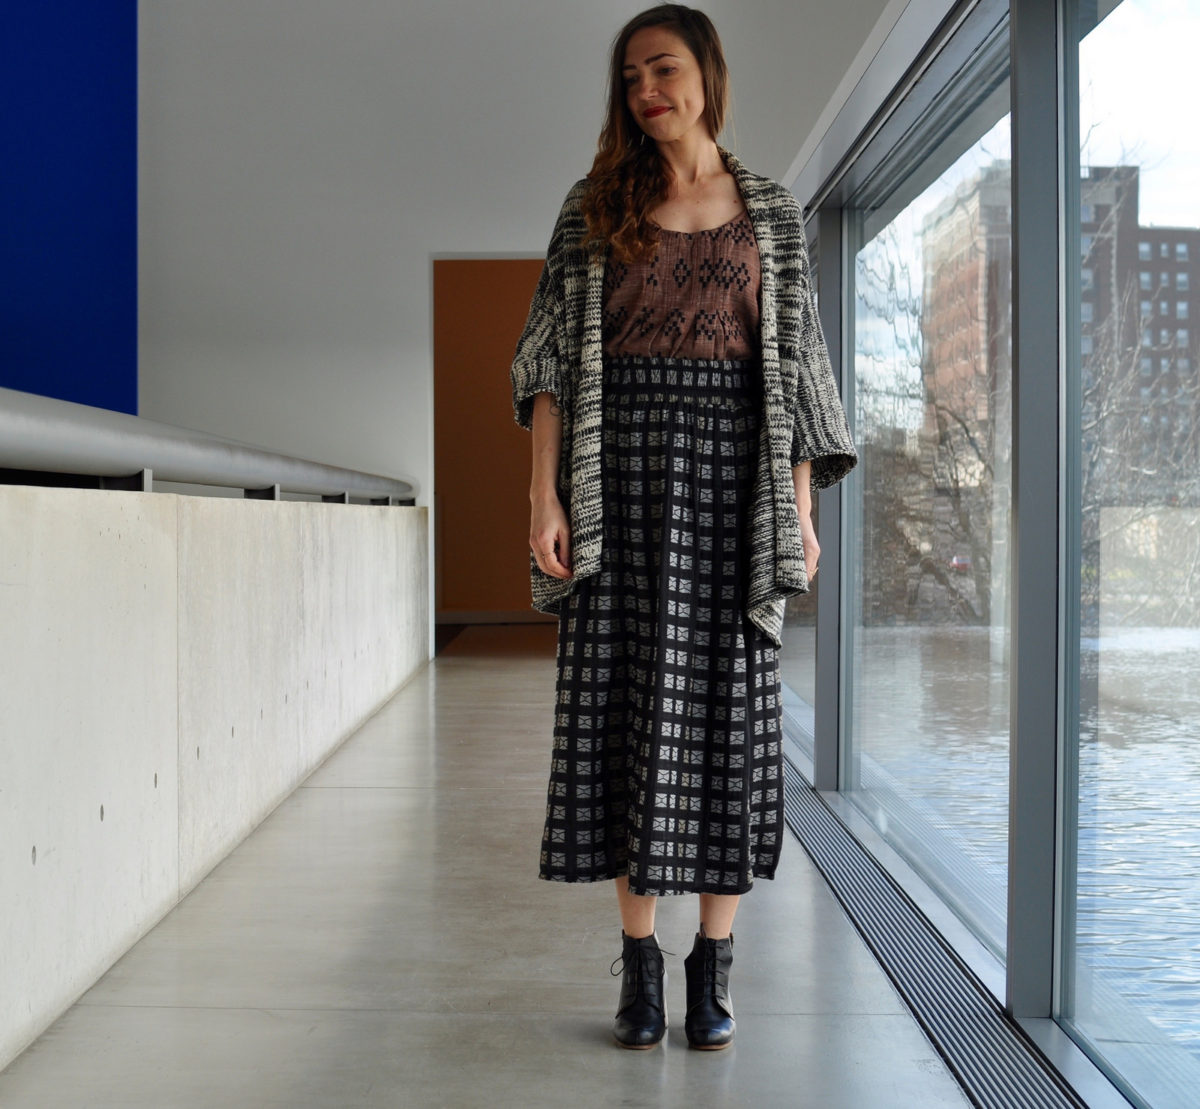 Dress That Mama: Pattern Mixing, Clay & Black